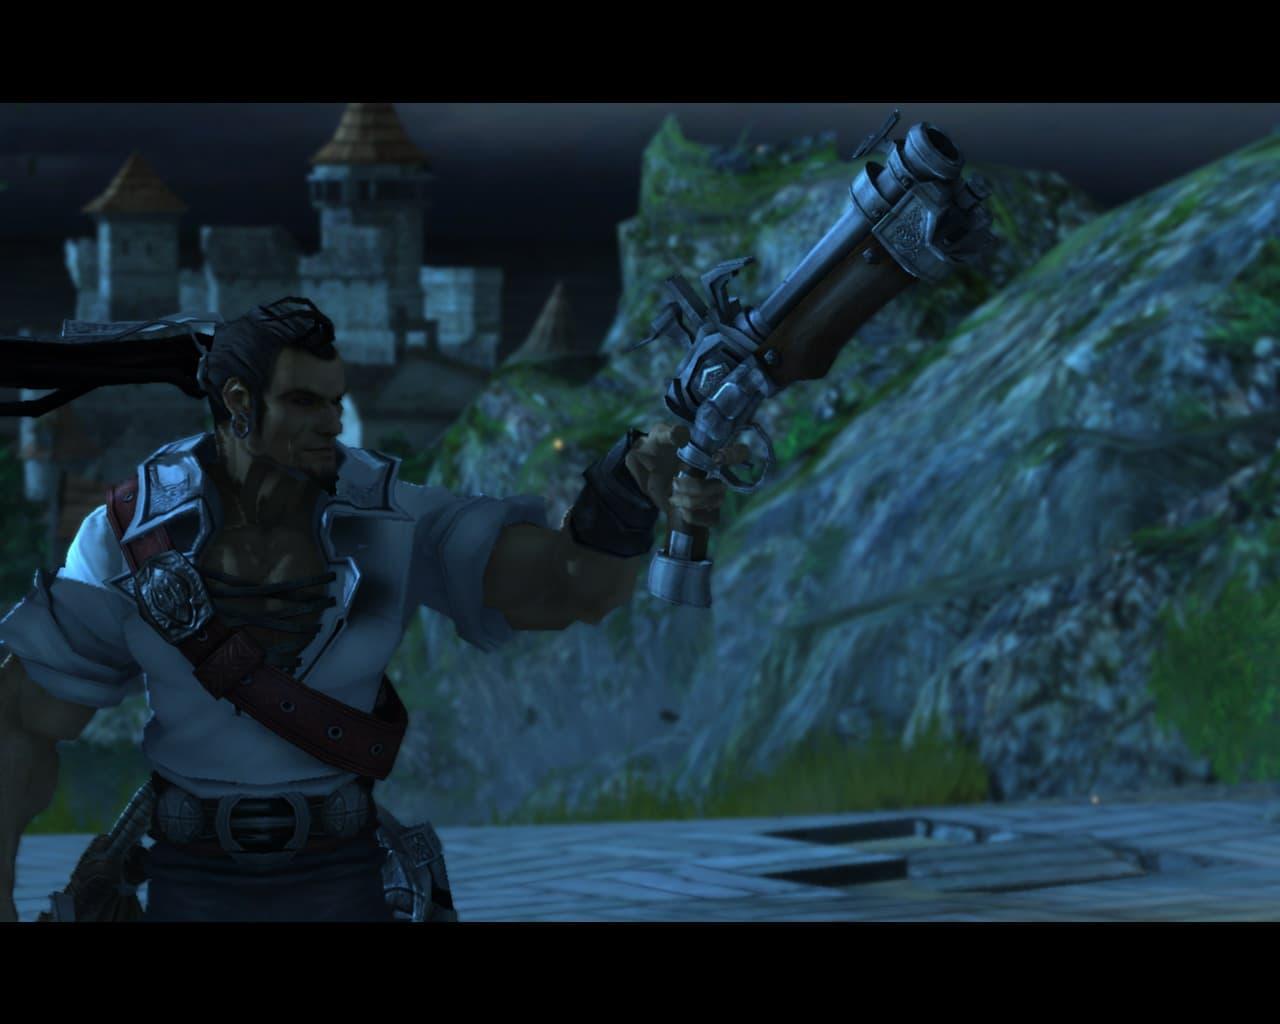 Xbox 360 Captain Blood